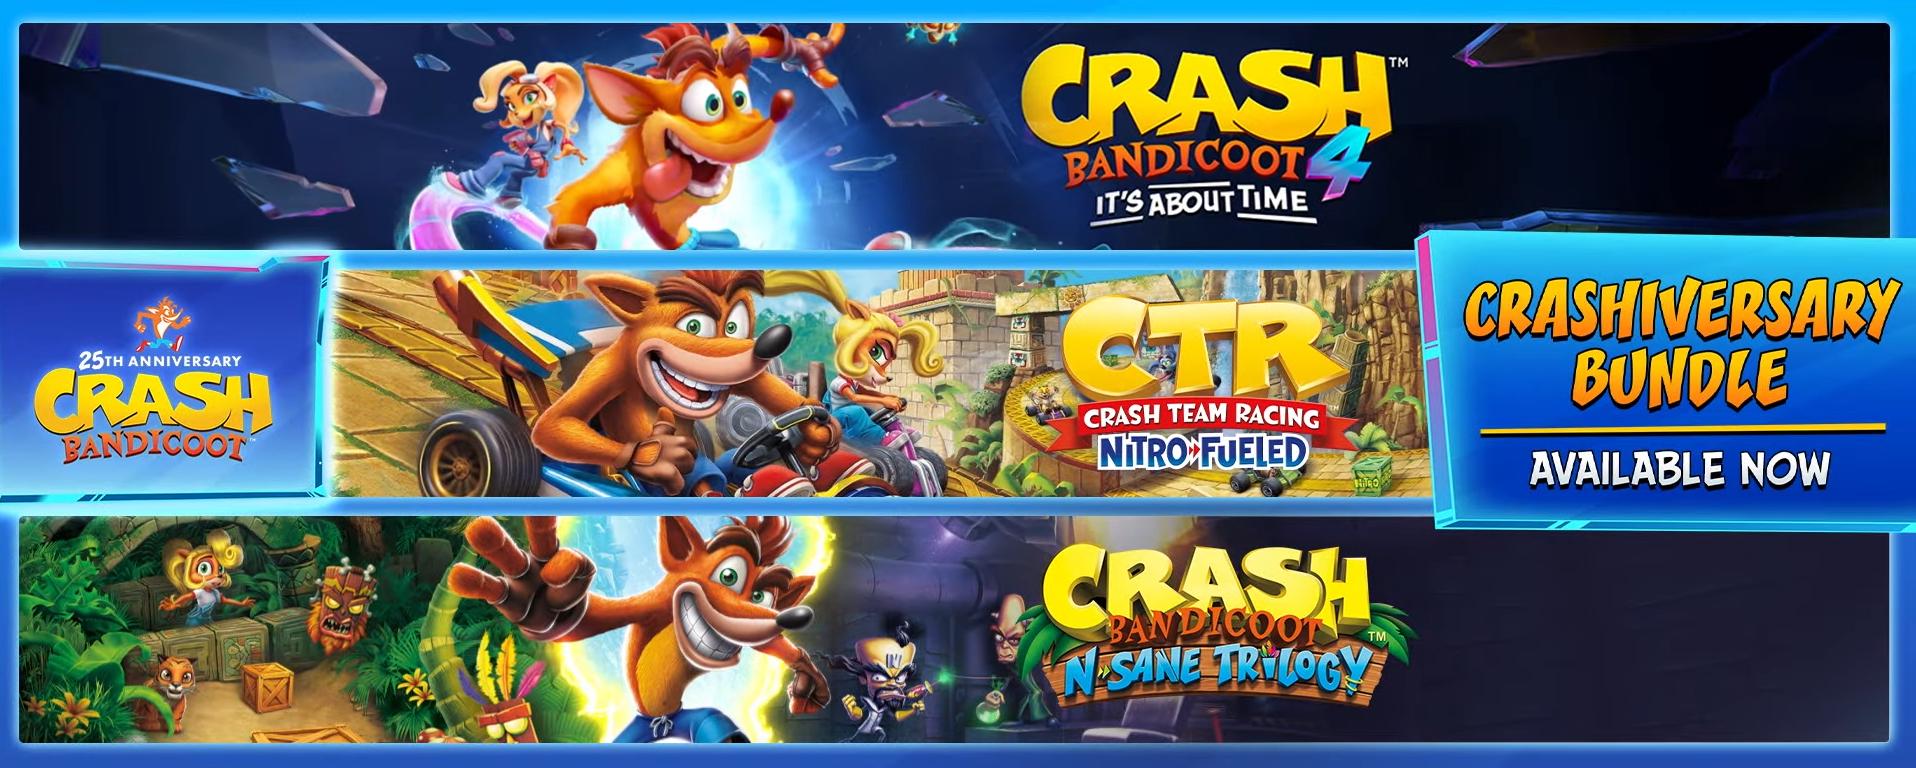 Crash Bandicoot bundle